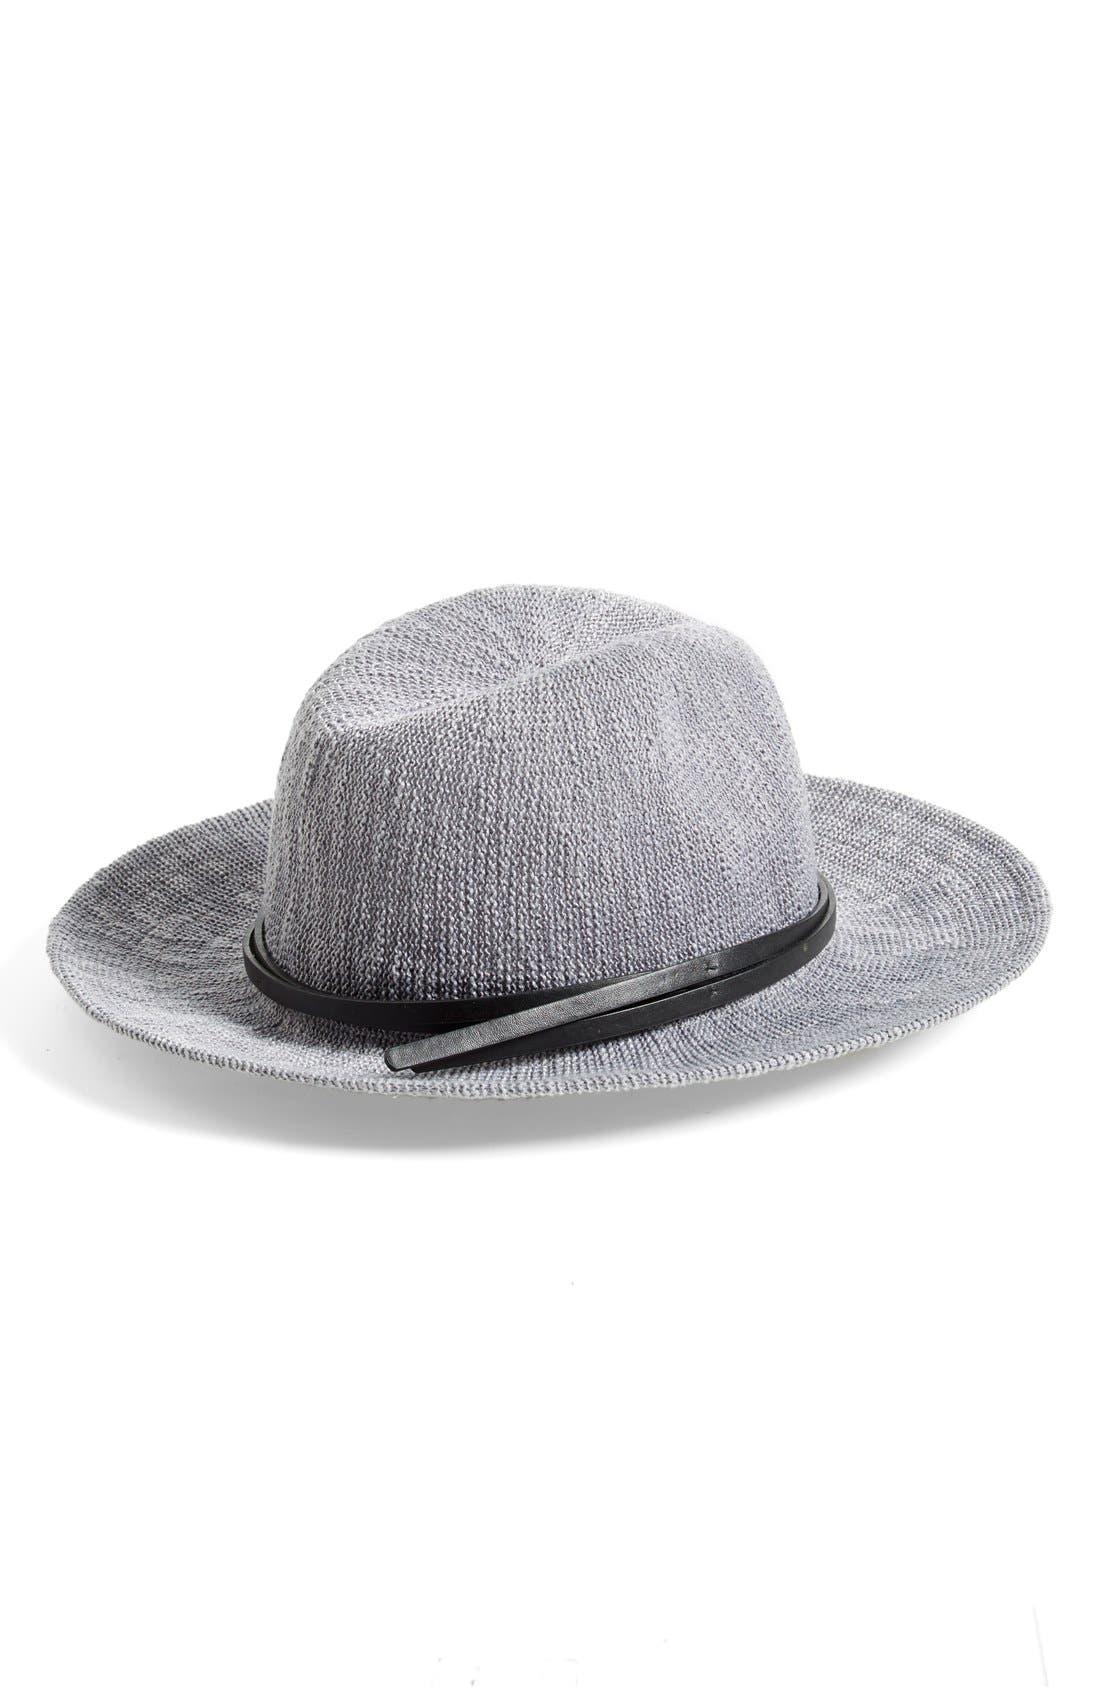 Alternate Image 1 Selected - Phase 3 Knit Wide Brim Hat